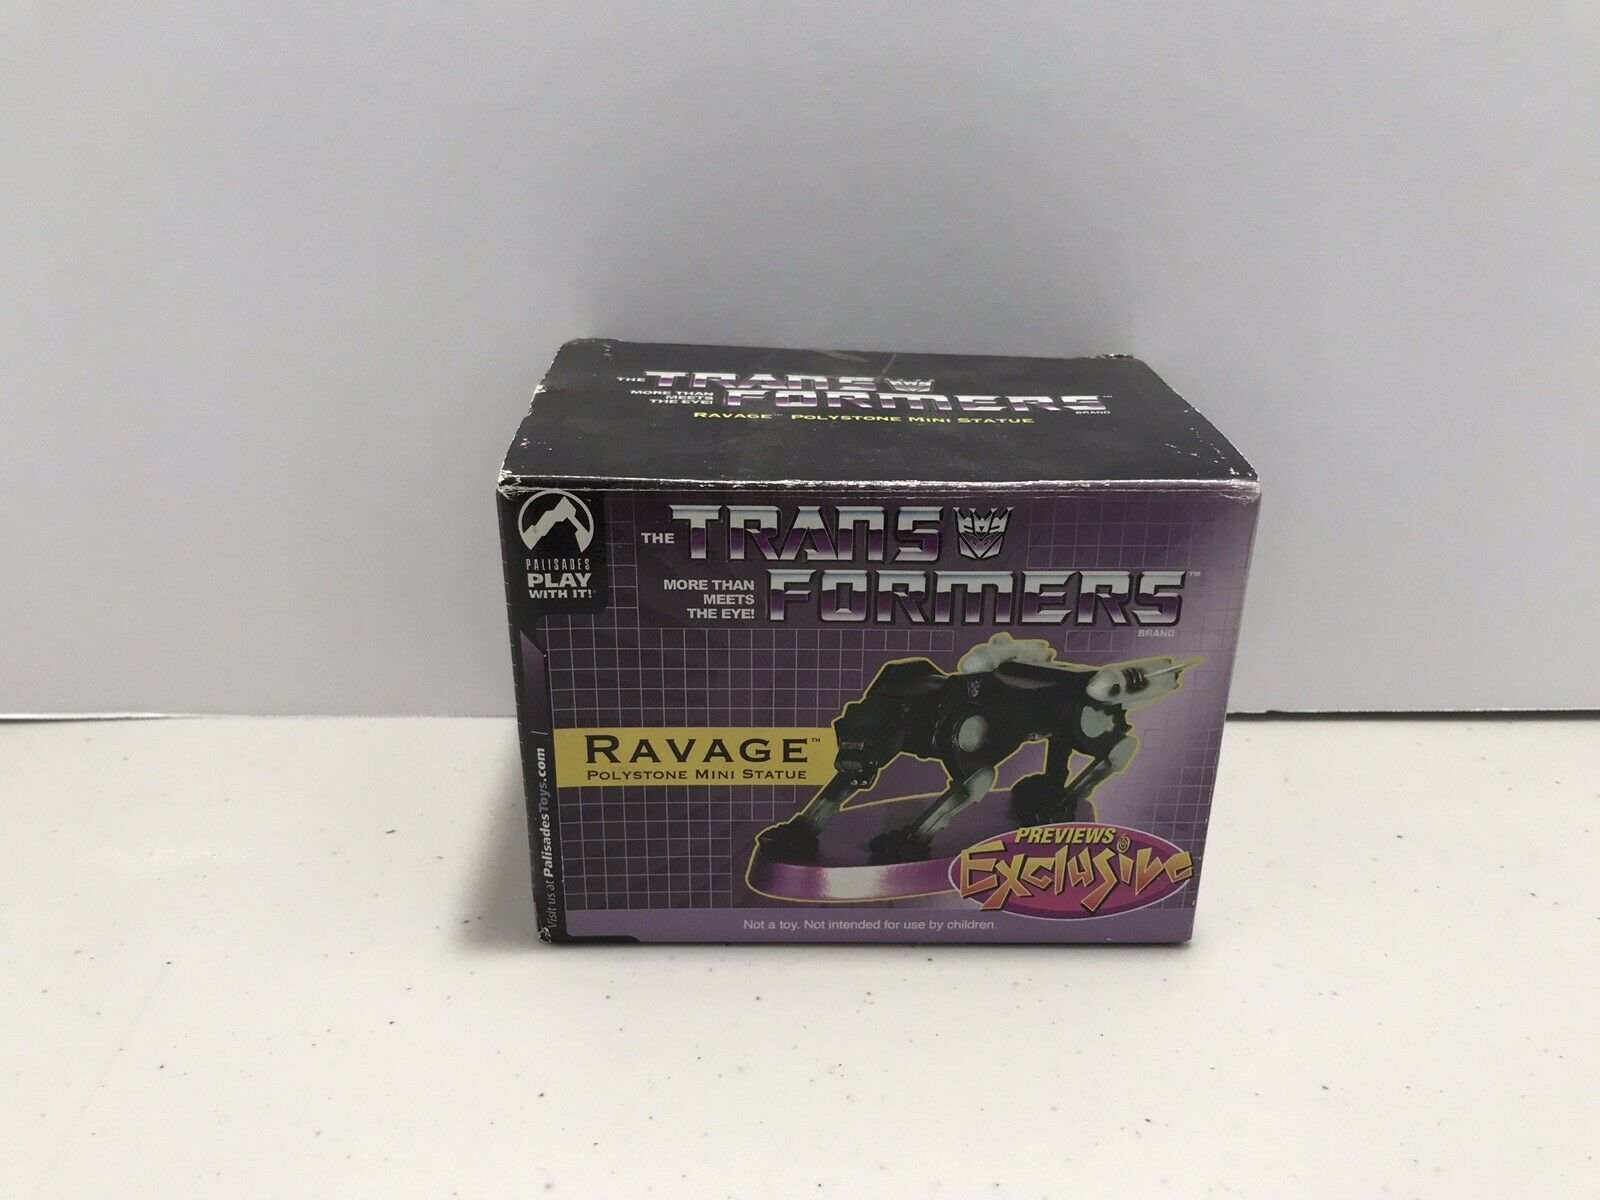 Transformers Previews Exclusive Ravage Mini Statue